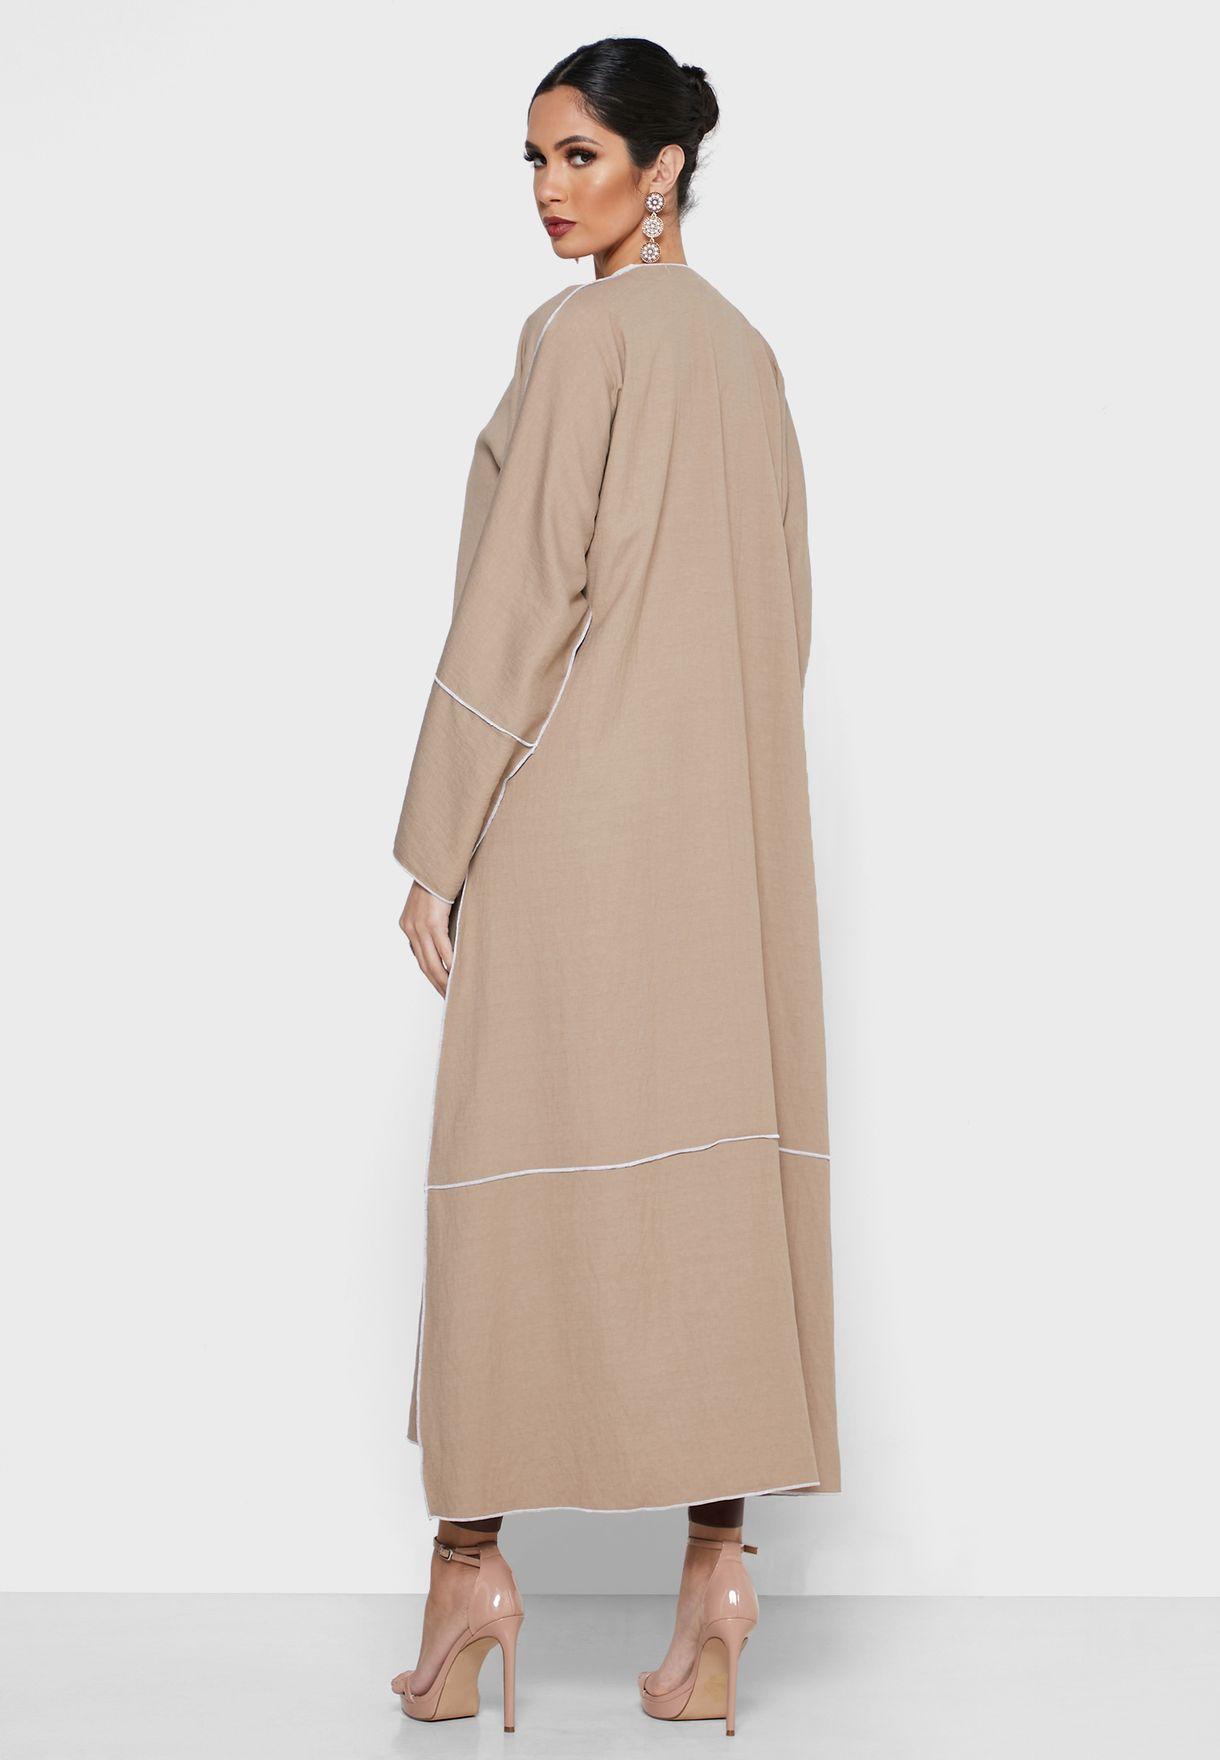 Contrast Stitched Abaya